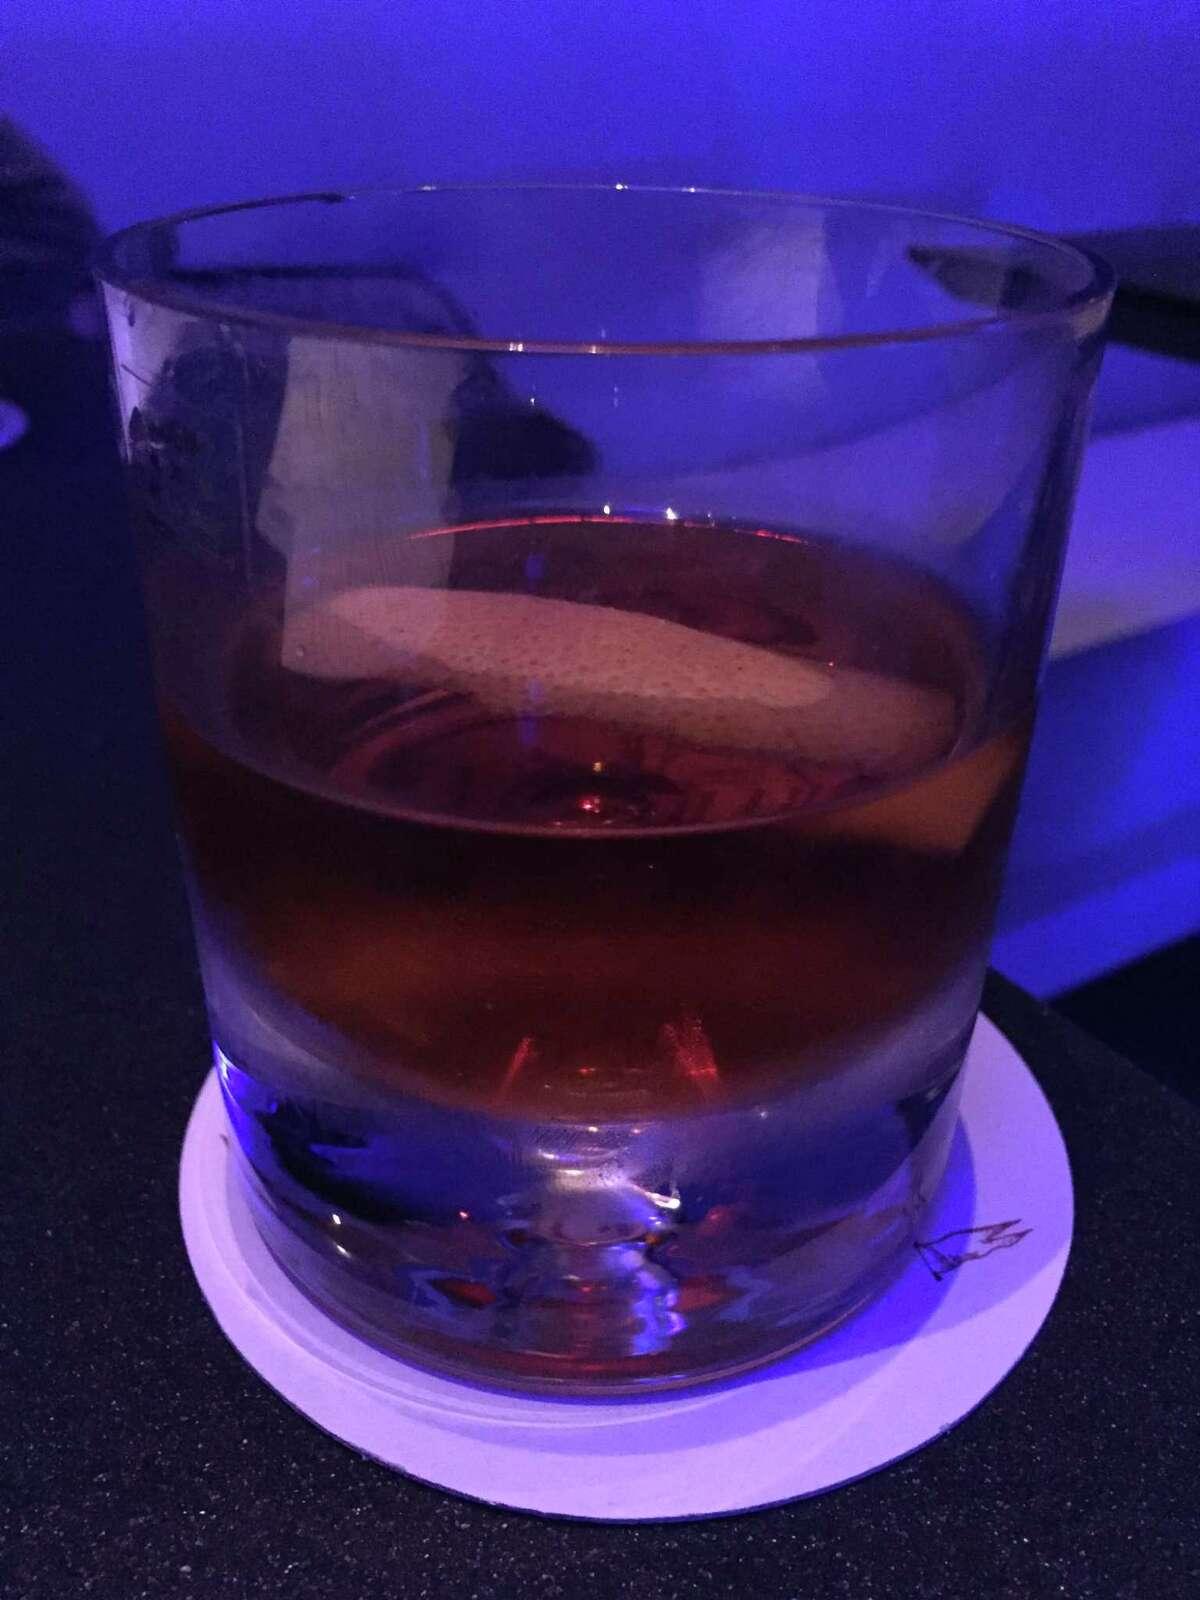 Greed: Garrison Brothers bourbon, amaretto liqueur, Bénédictine, bitters